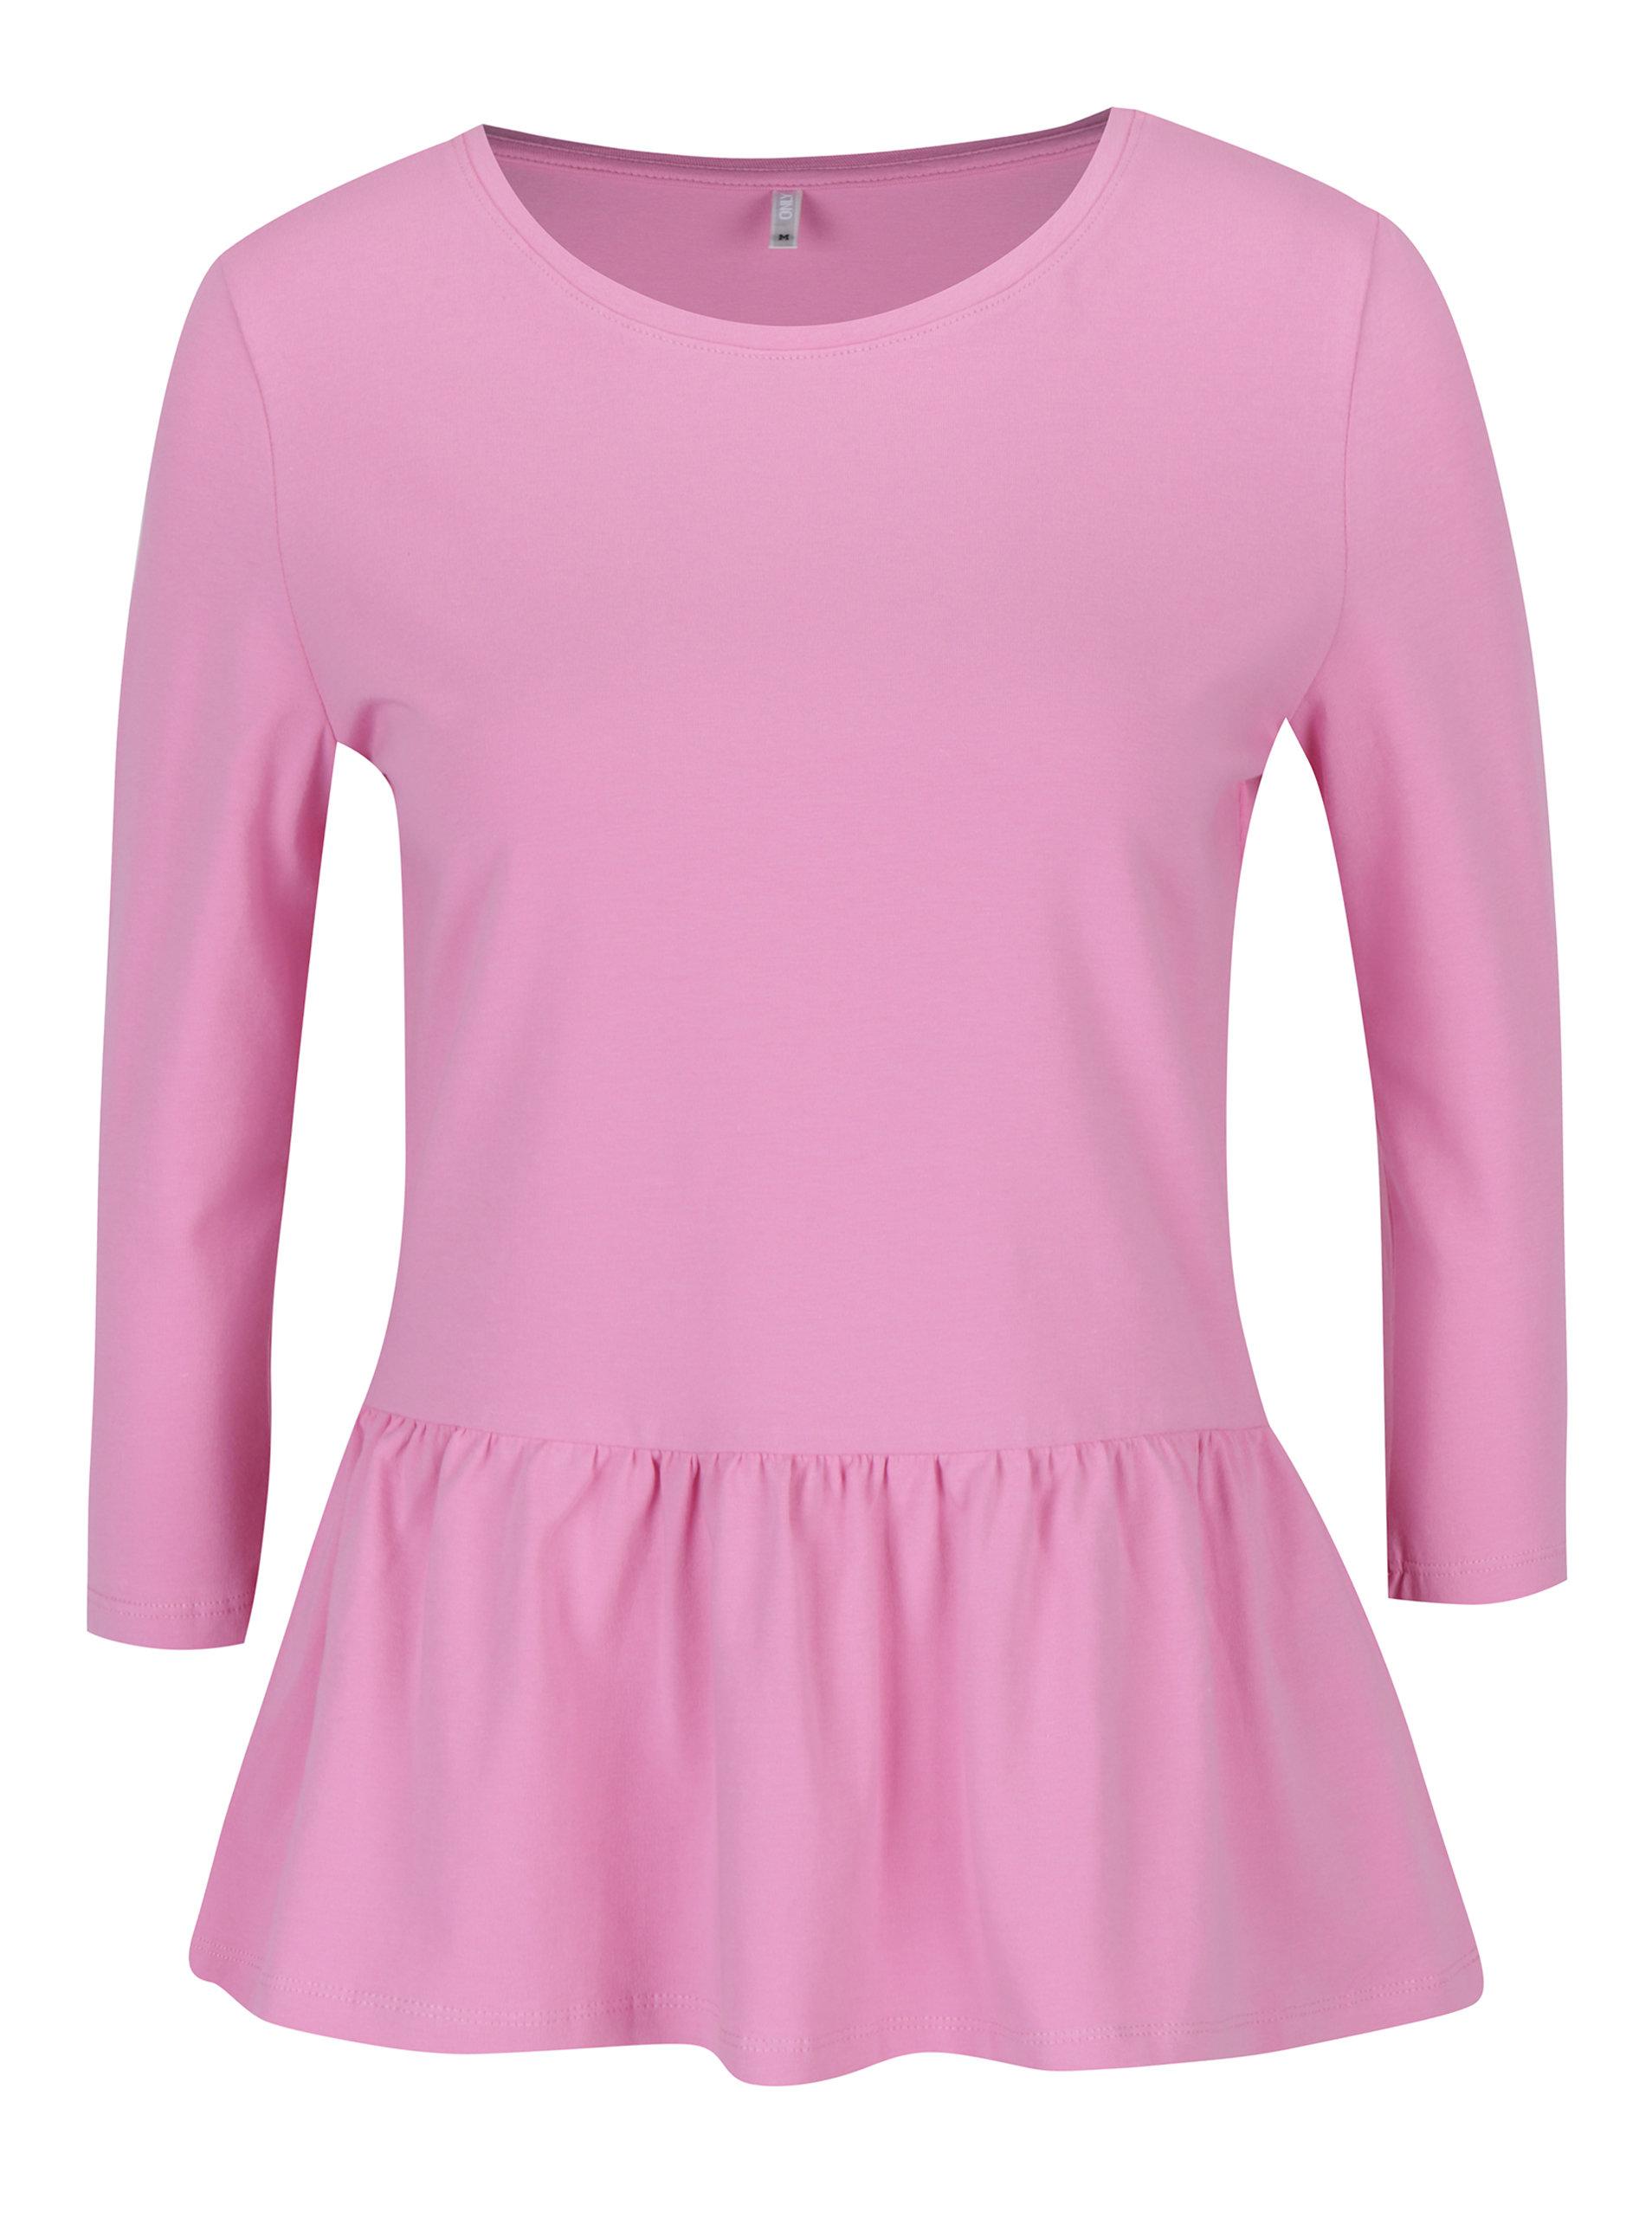 f491f2f18aaf Ružové tričko s 3 4 rukávom a volánom ONLY Live ...